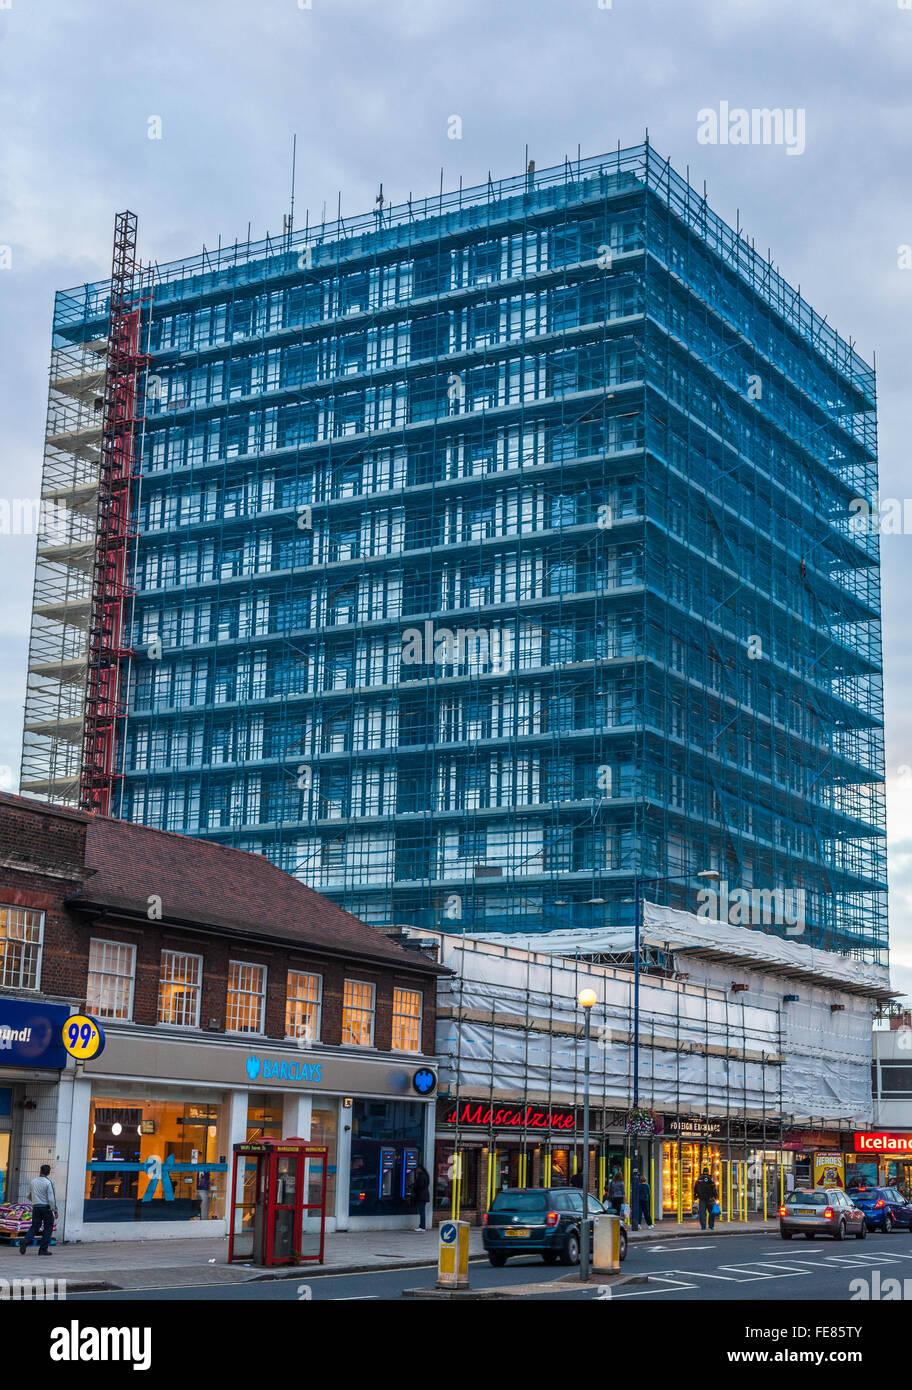 Scaffolding netting on building, Edgware, Greater London, England, UK. - Stock Image